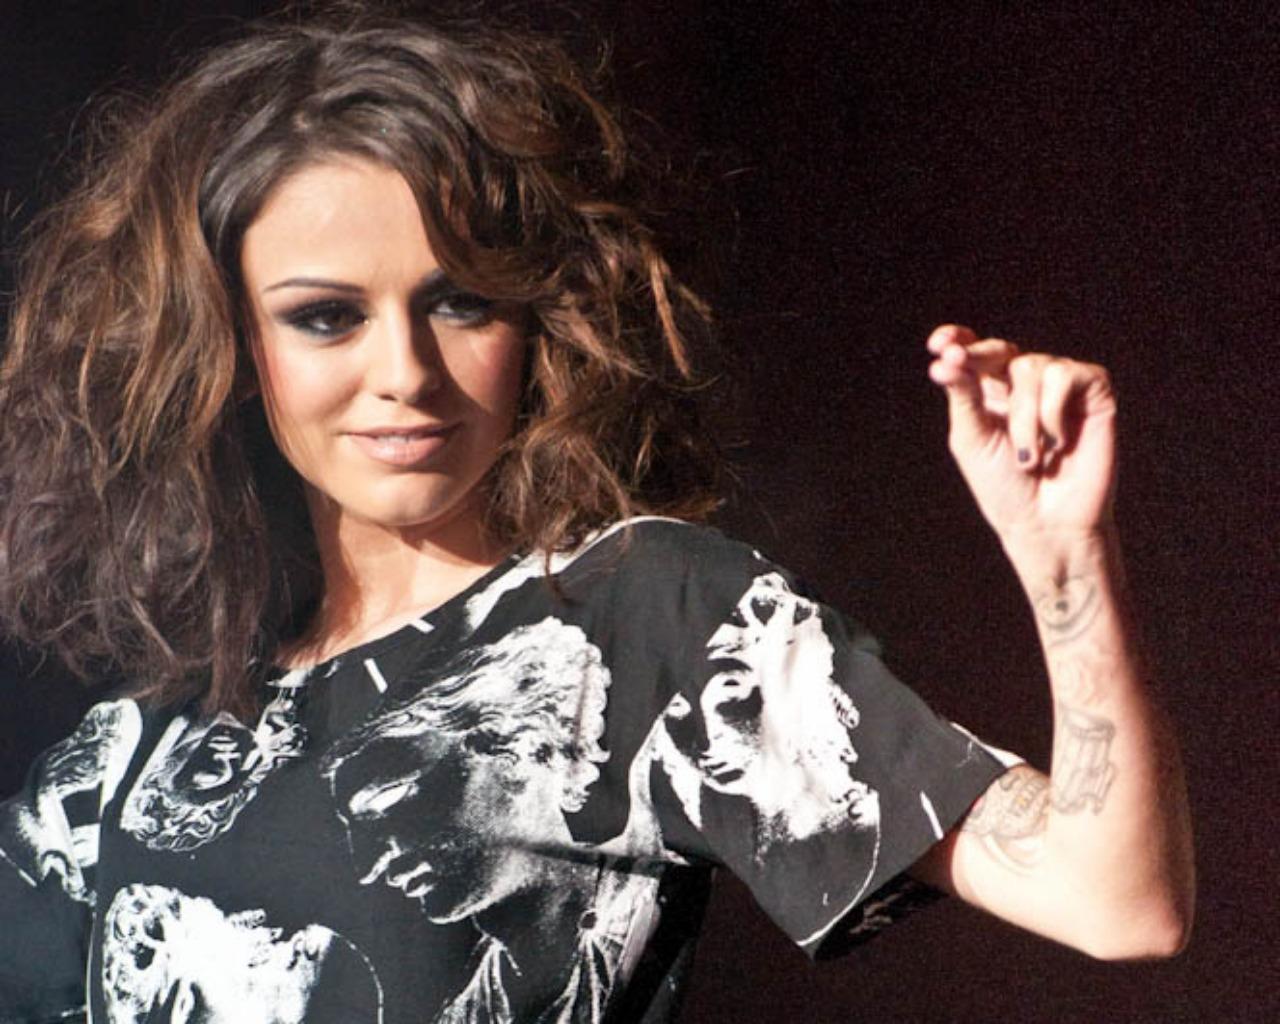 Cherlloyd Cher Lloyd 壁紙 ファンポップ